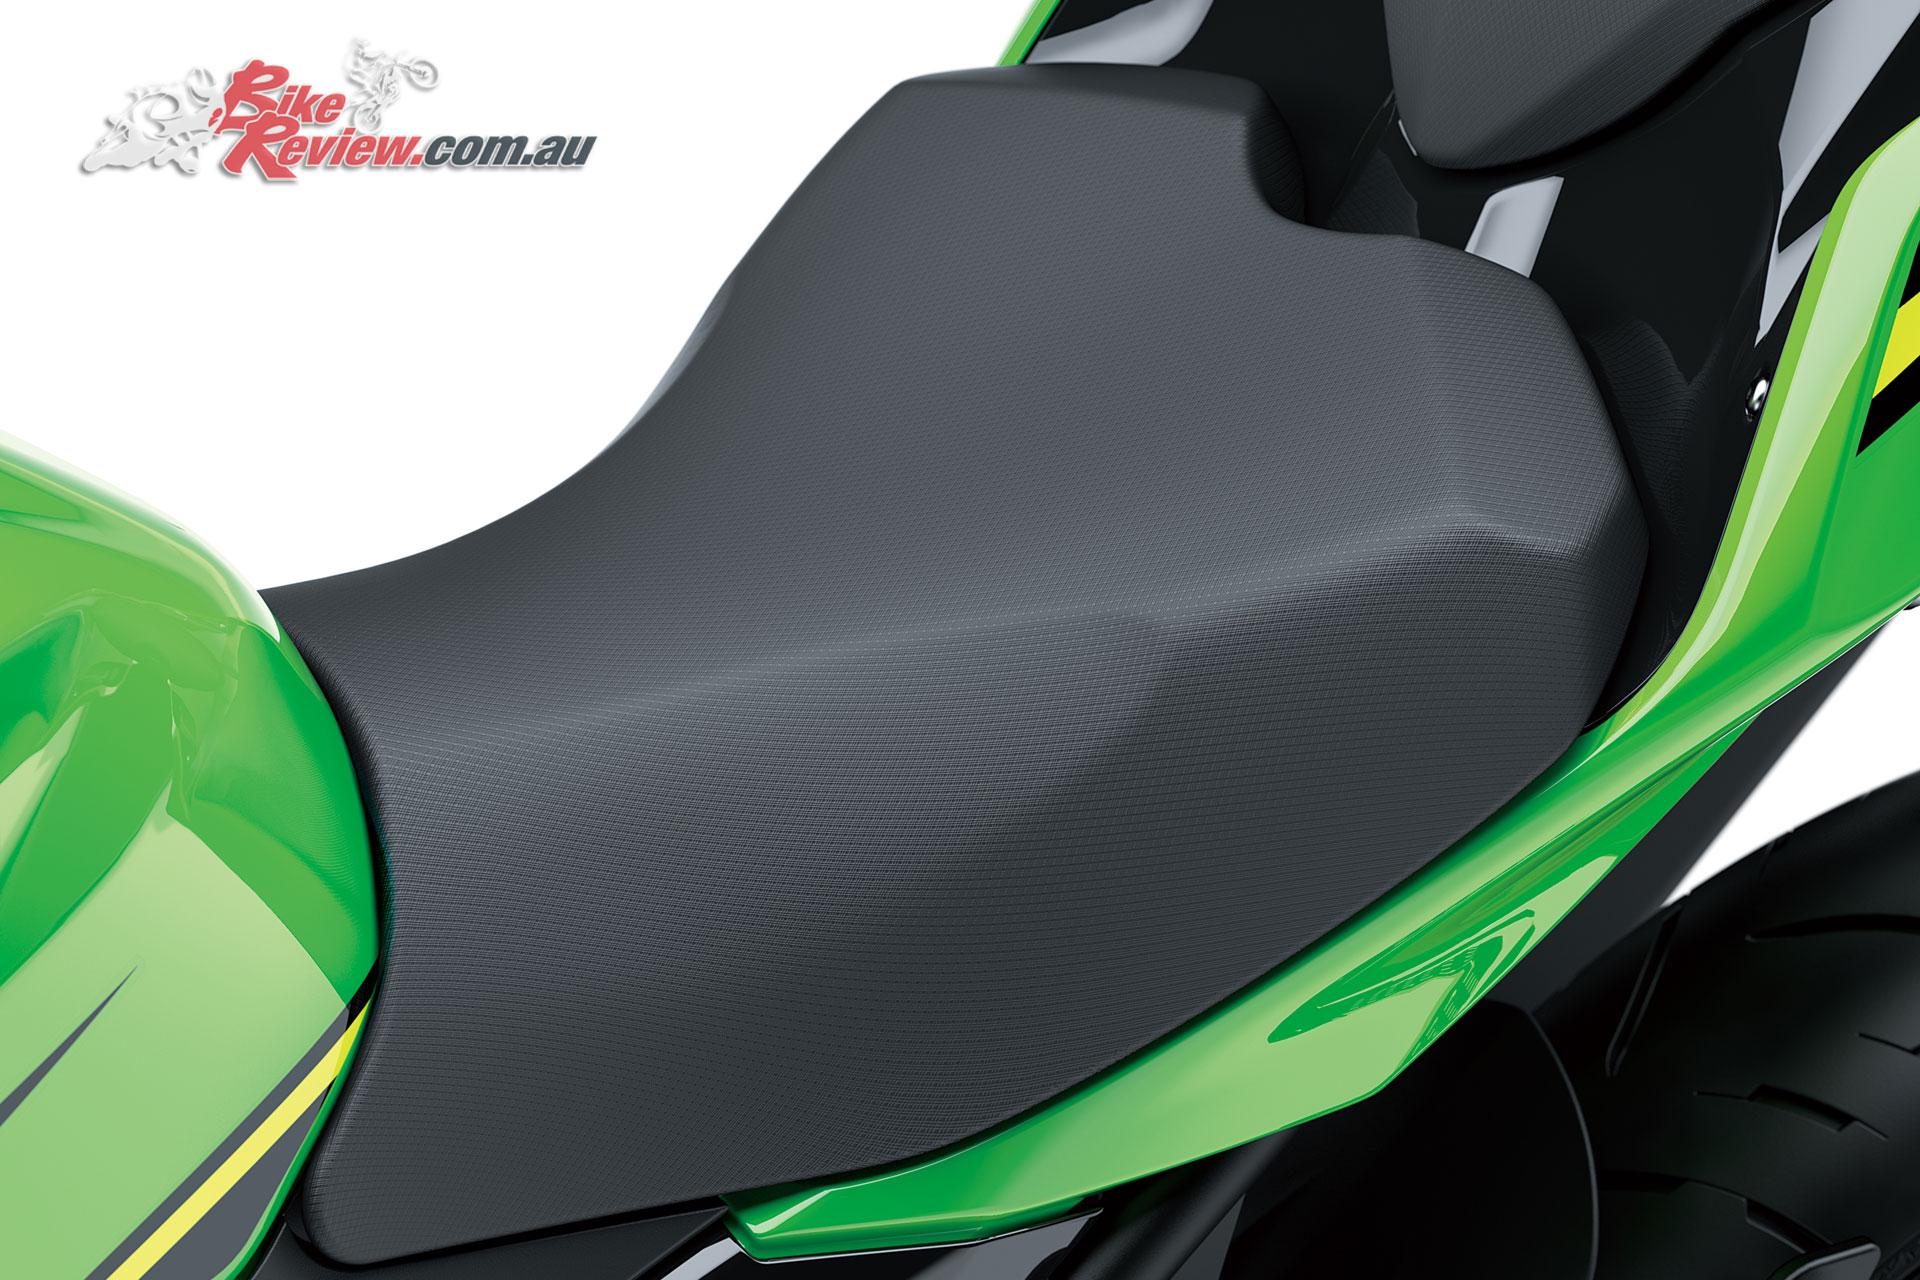 2018-Kawasaki-Ninja-400-LAMS-Bike-Review-EX400G-19